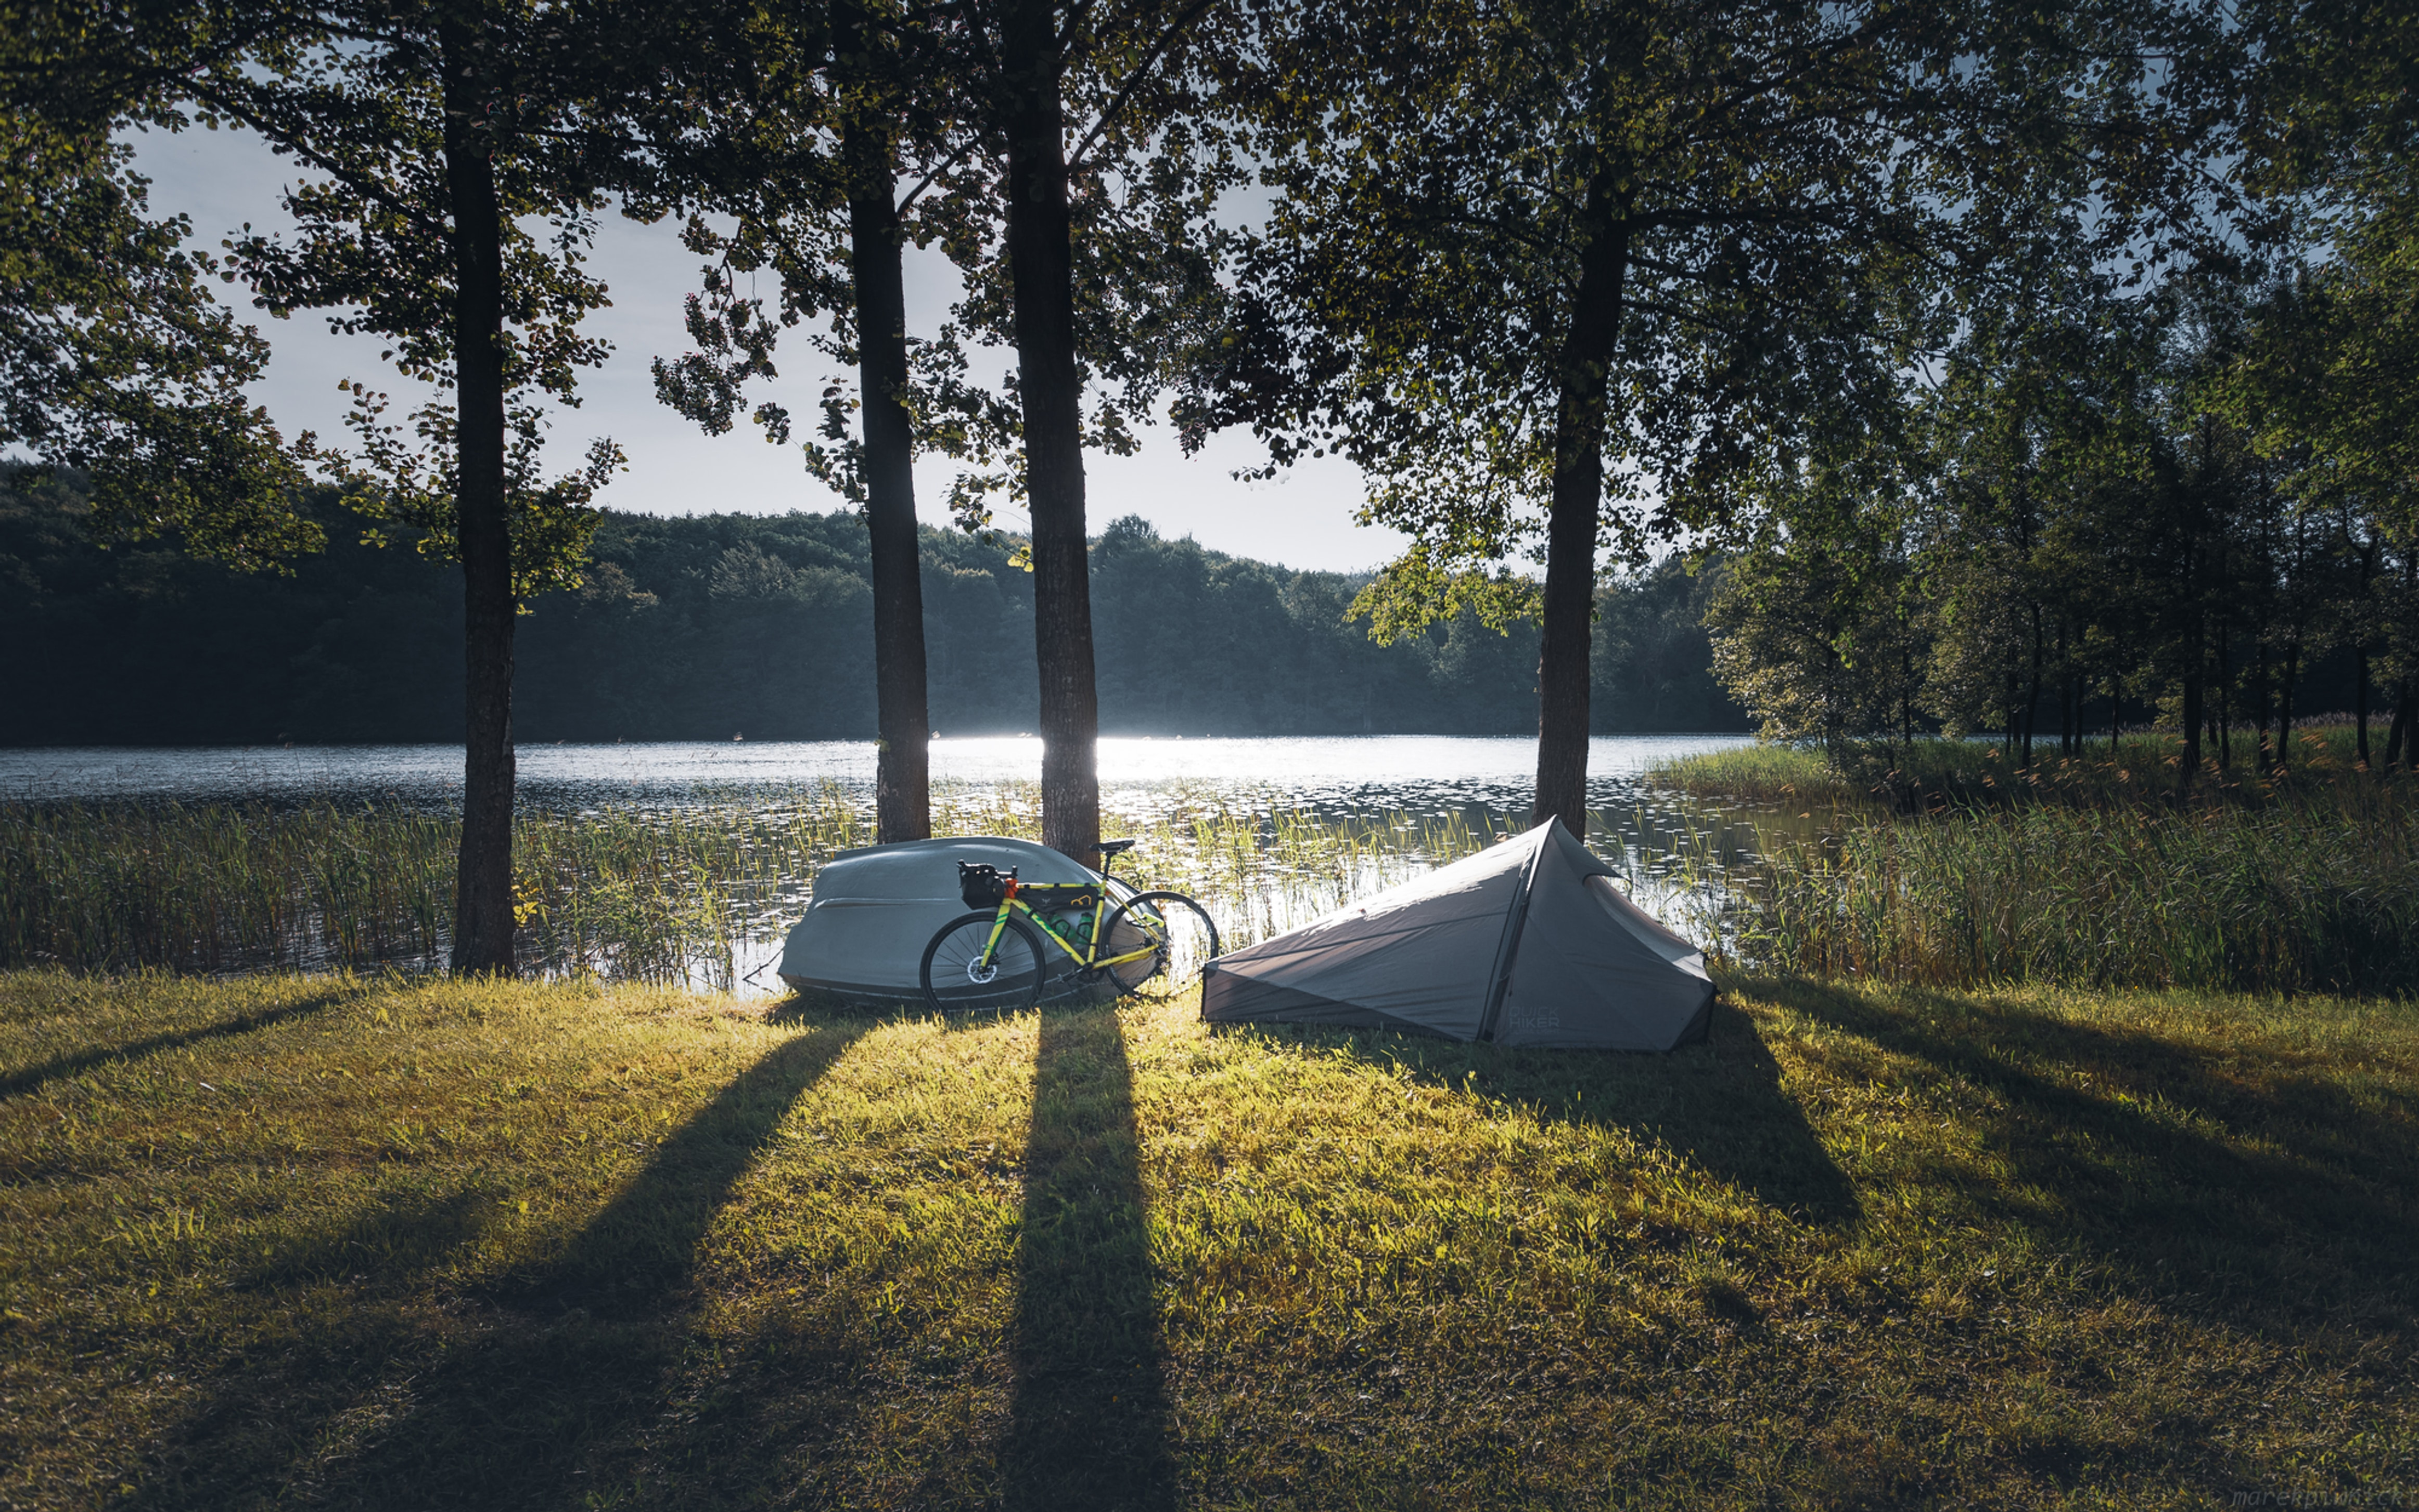 Rural Wilderness camping